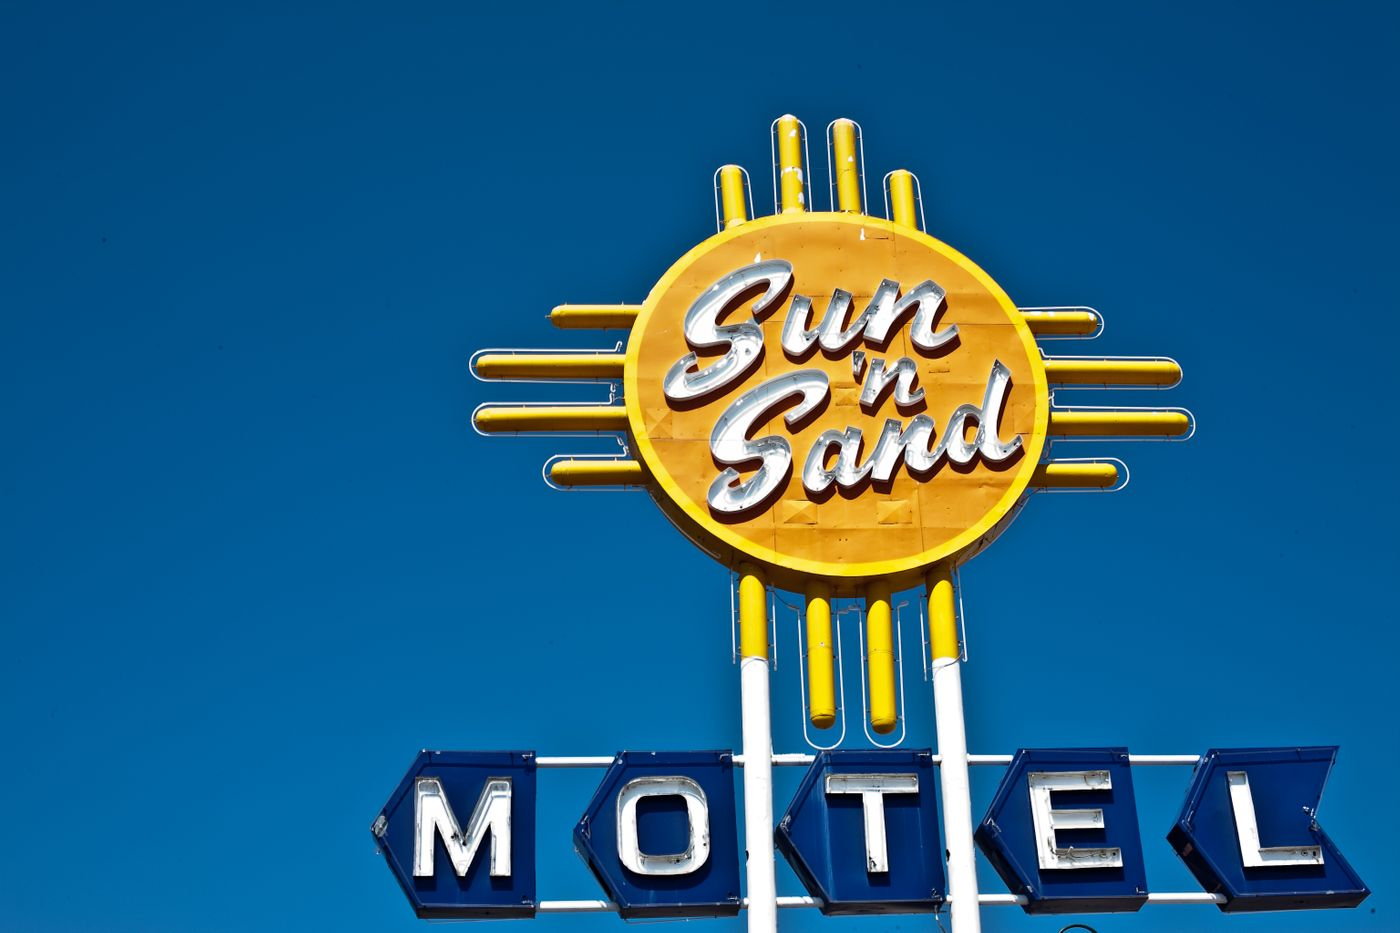 motel-web-2020-jpg-14-PRINT.jpg